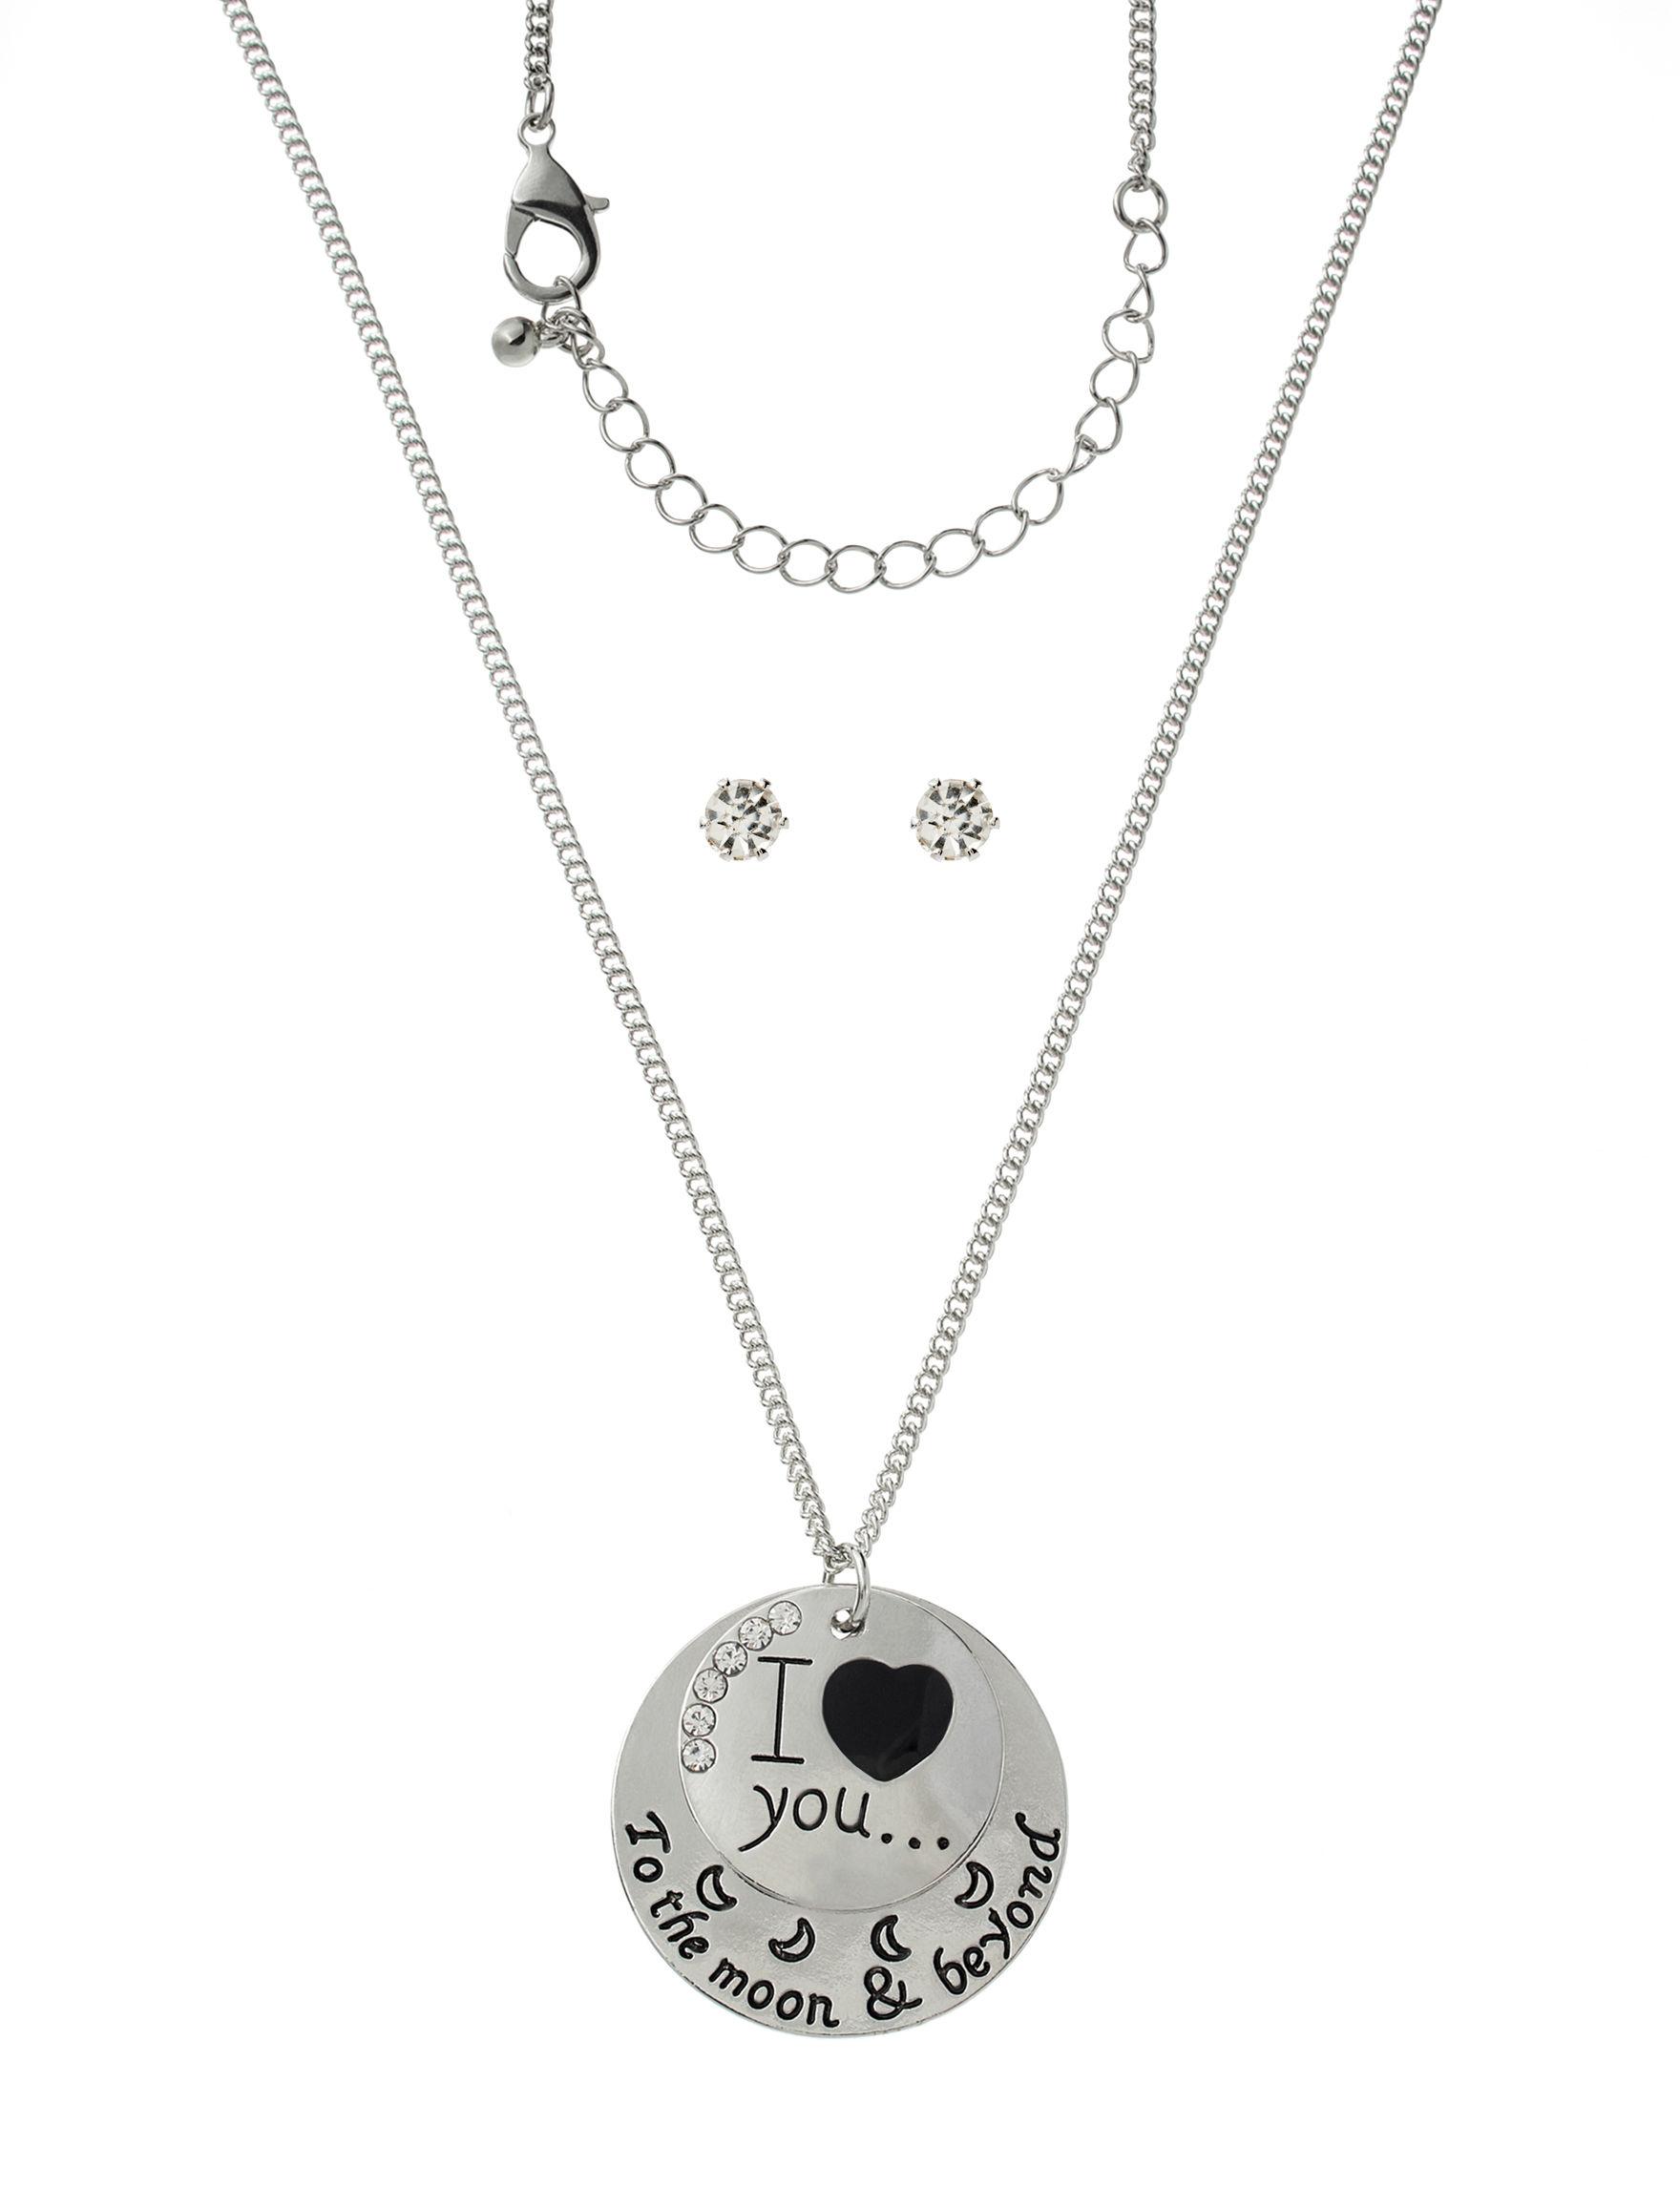 Tanya Two Tone Jewelry Sets Fashion Jewelry